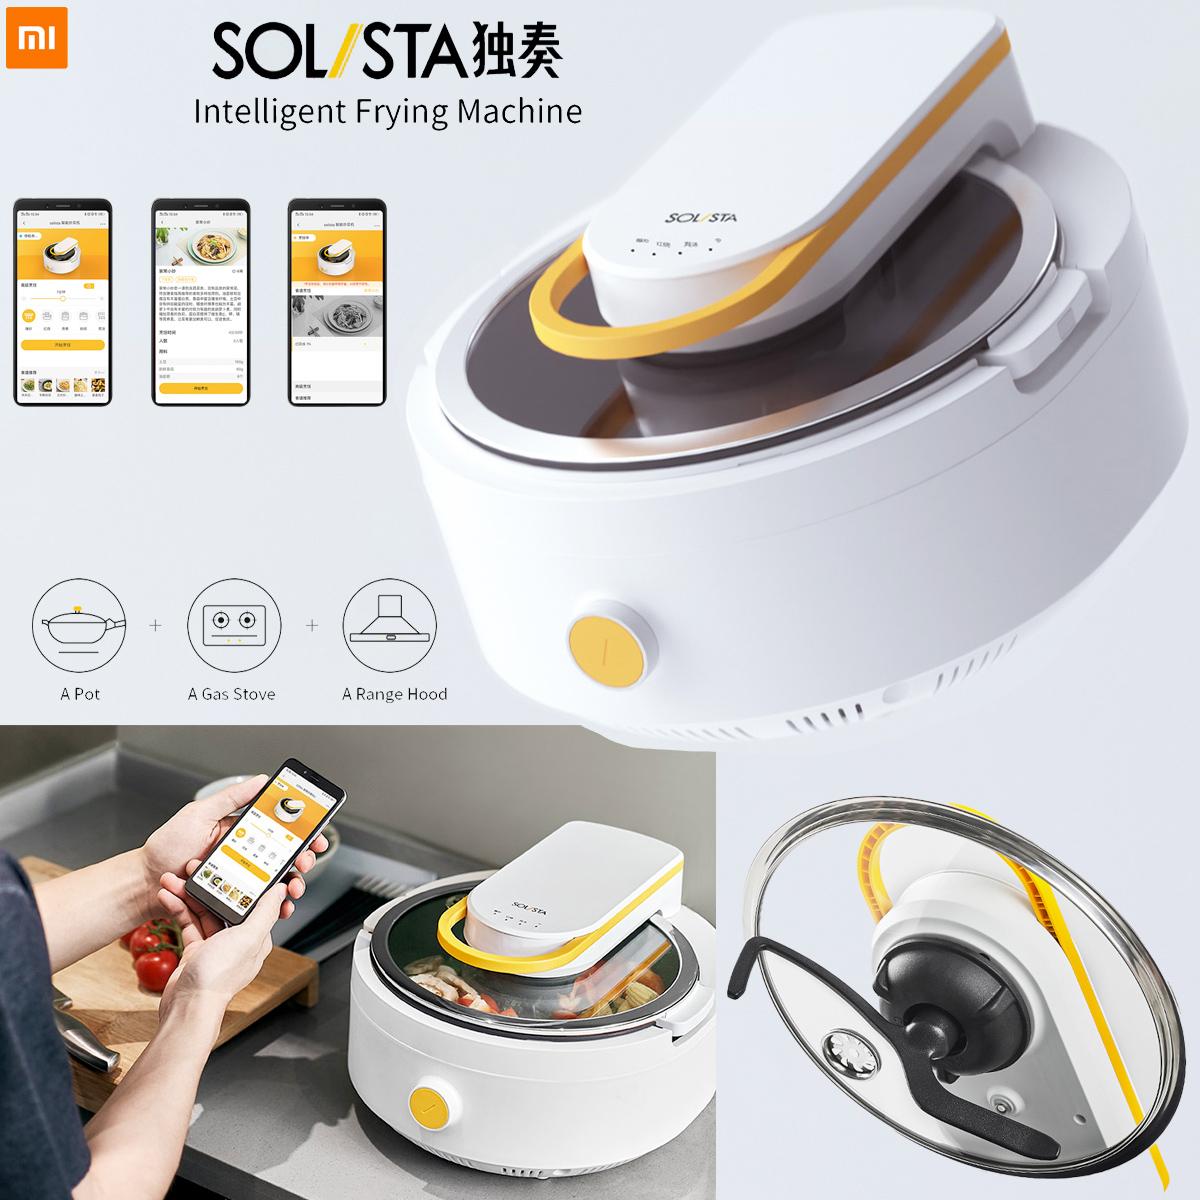 Panela Inteligente Eletrica Xiaomi Solista Solo Smart Cooking Machine